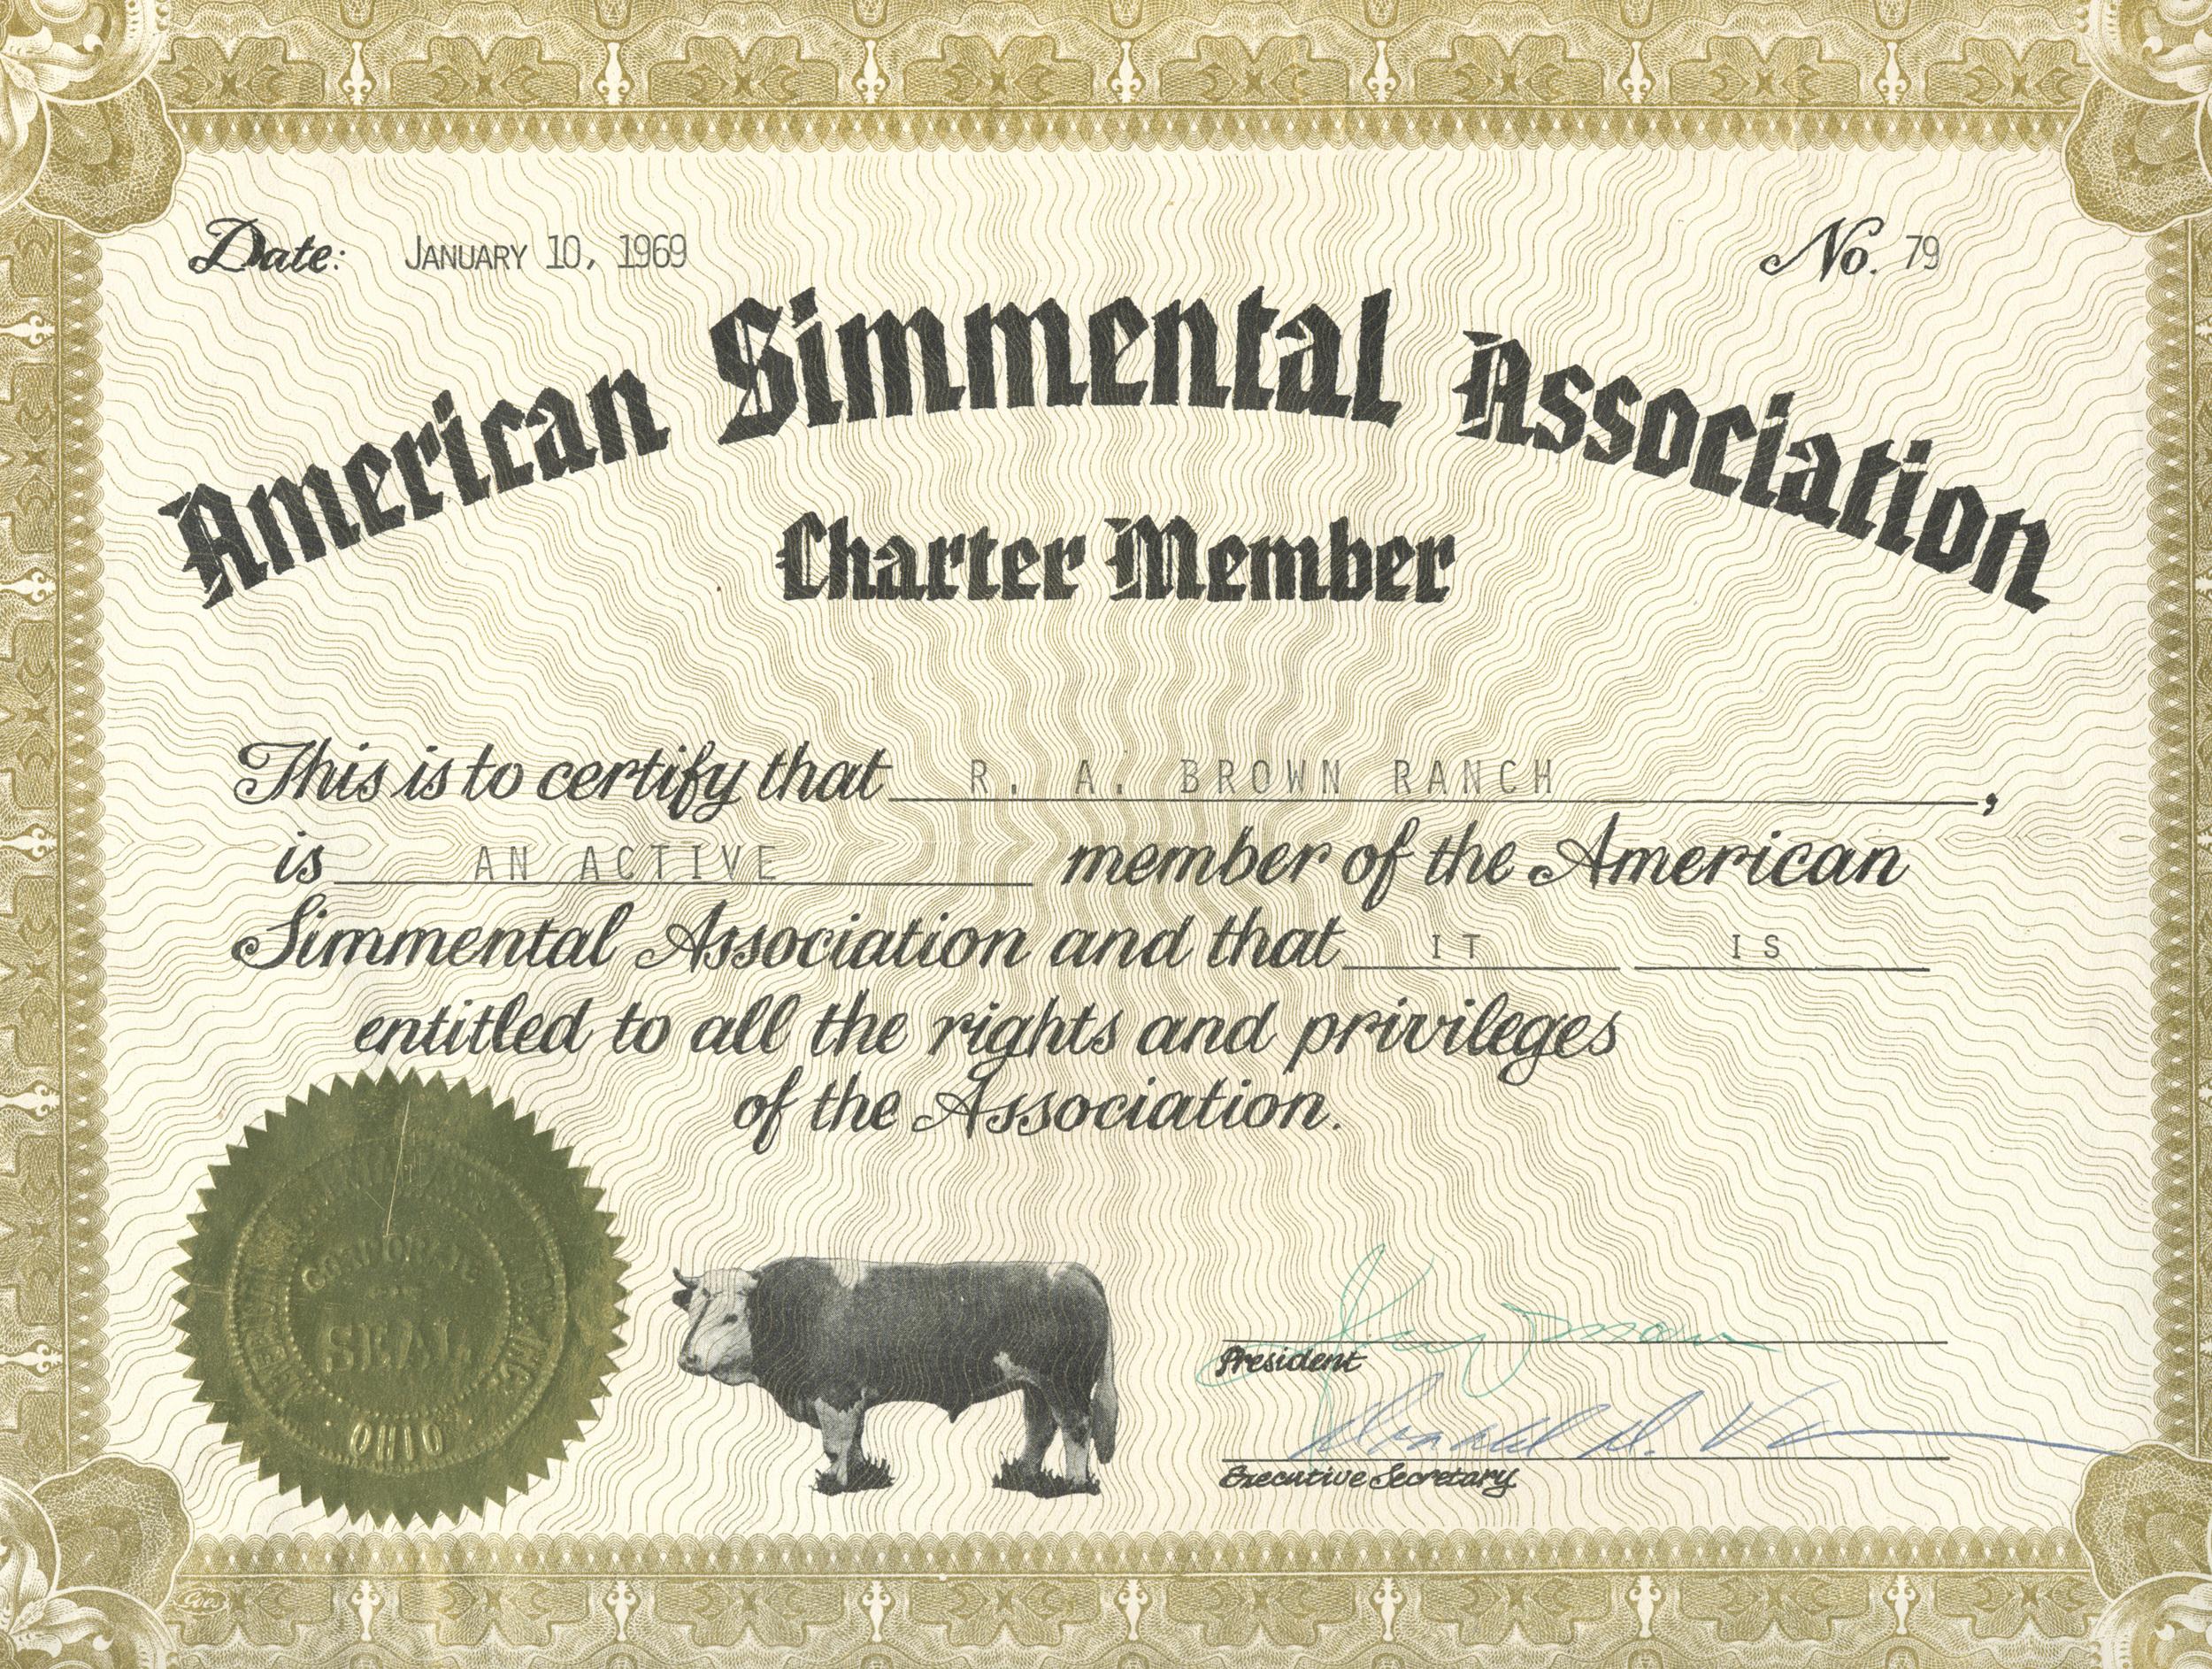 ASA Charter #79